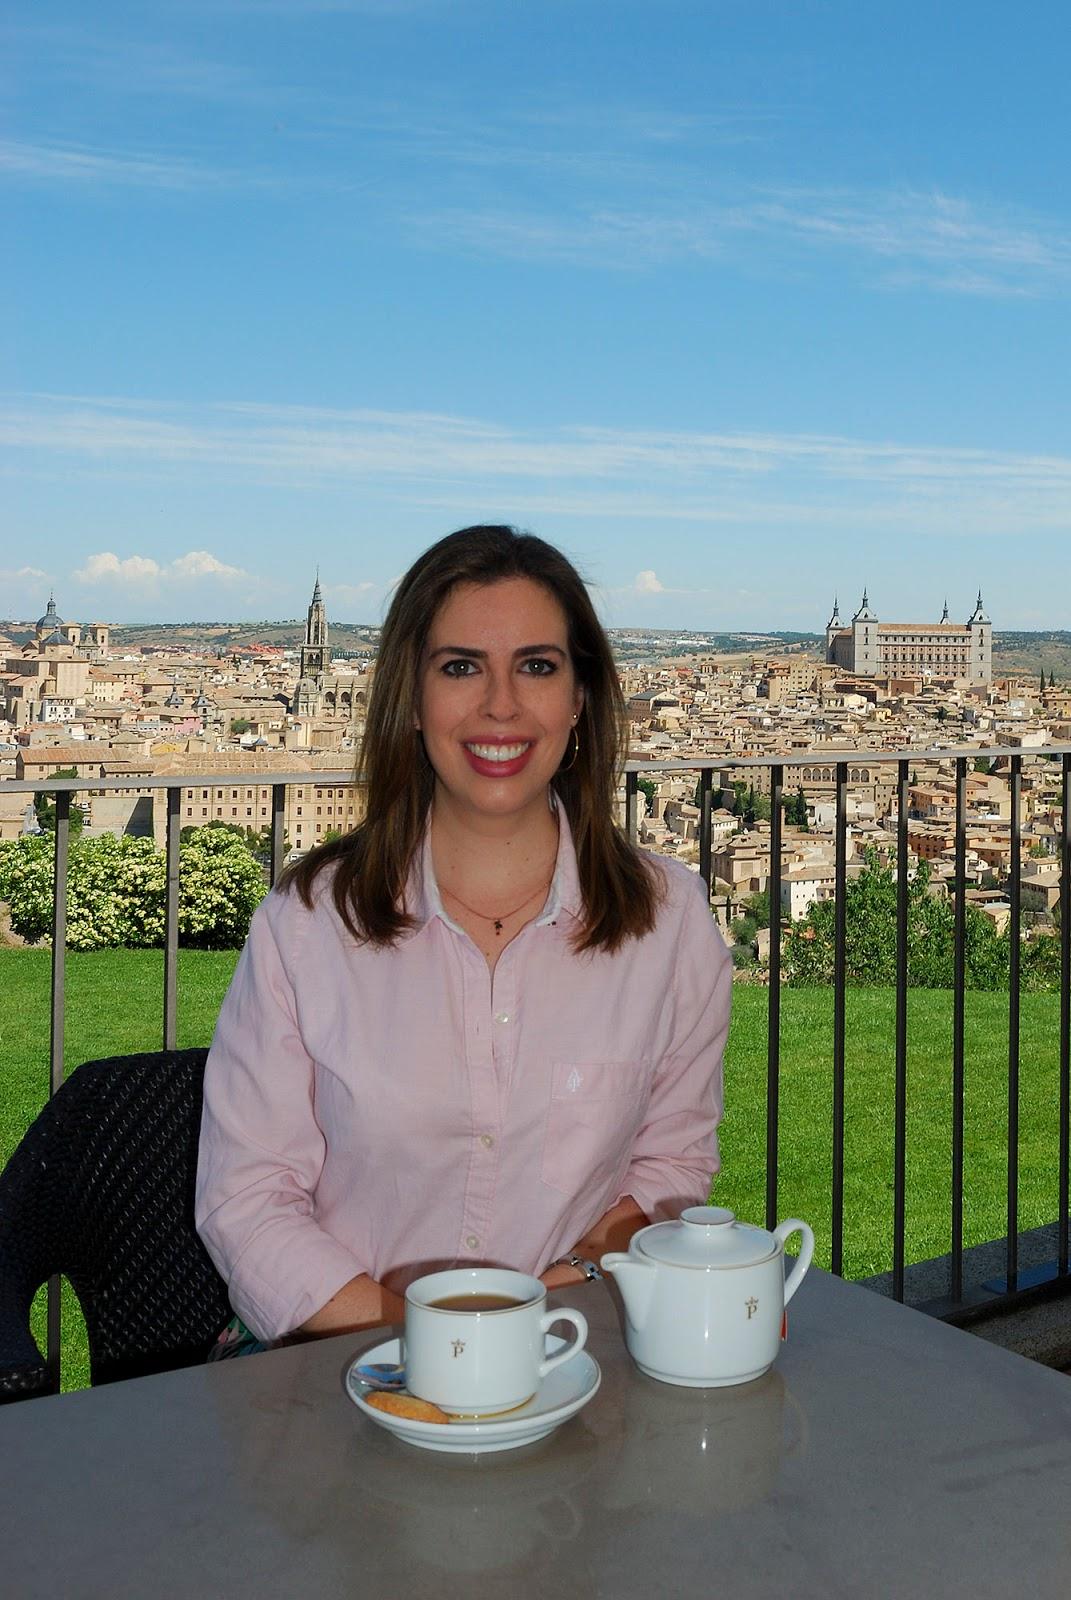 parador toledo spain cafeteria views vantage point travel outfit europe